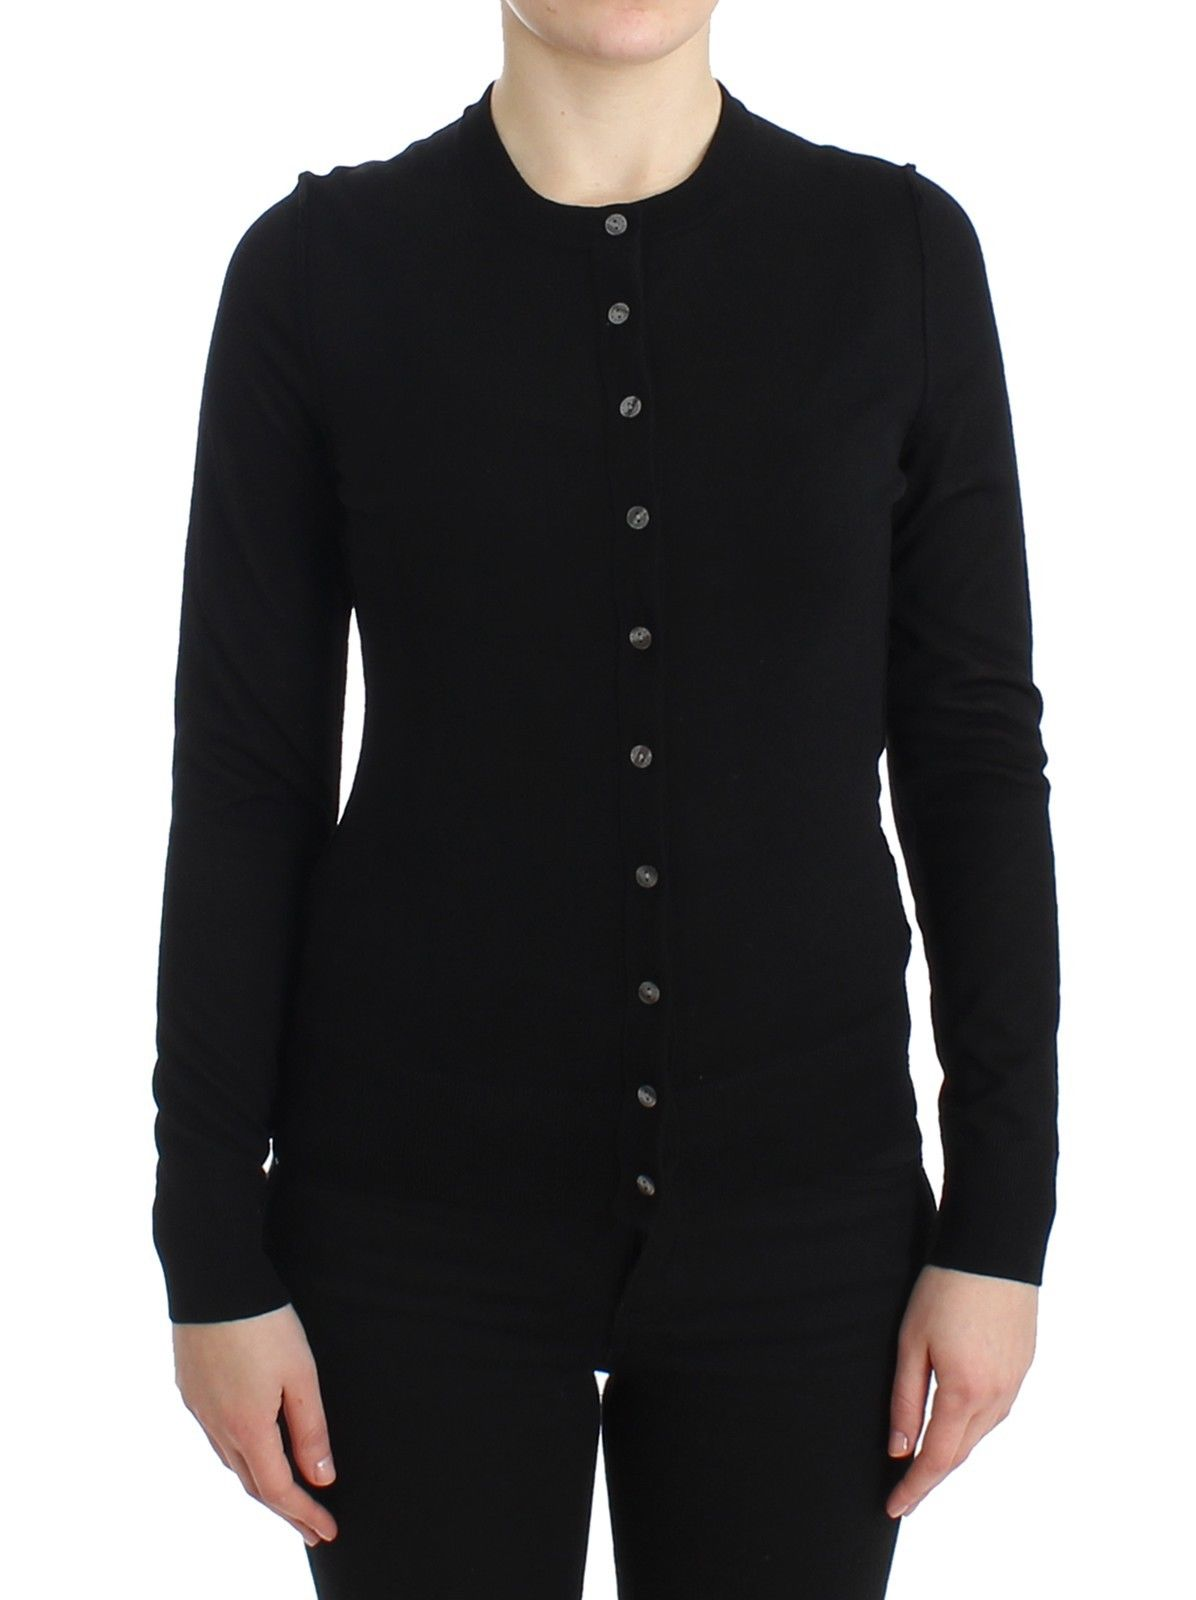 Dolce & Gabbana Women's STAFF Wool Cardigan Black SIG11739 - IT46